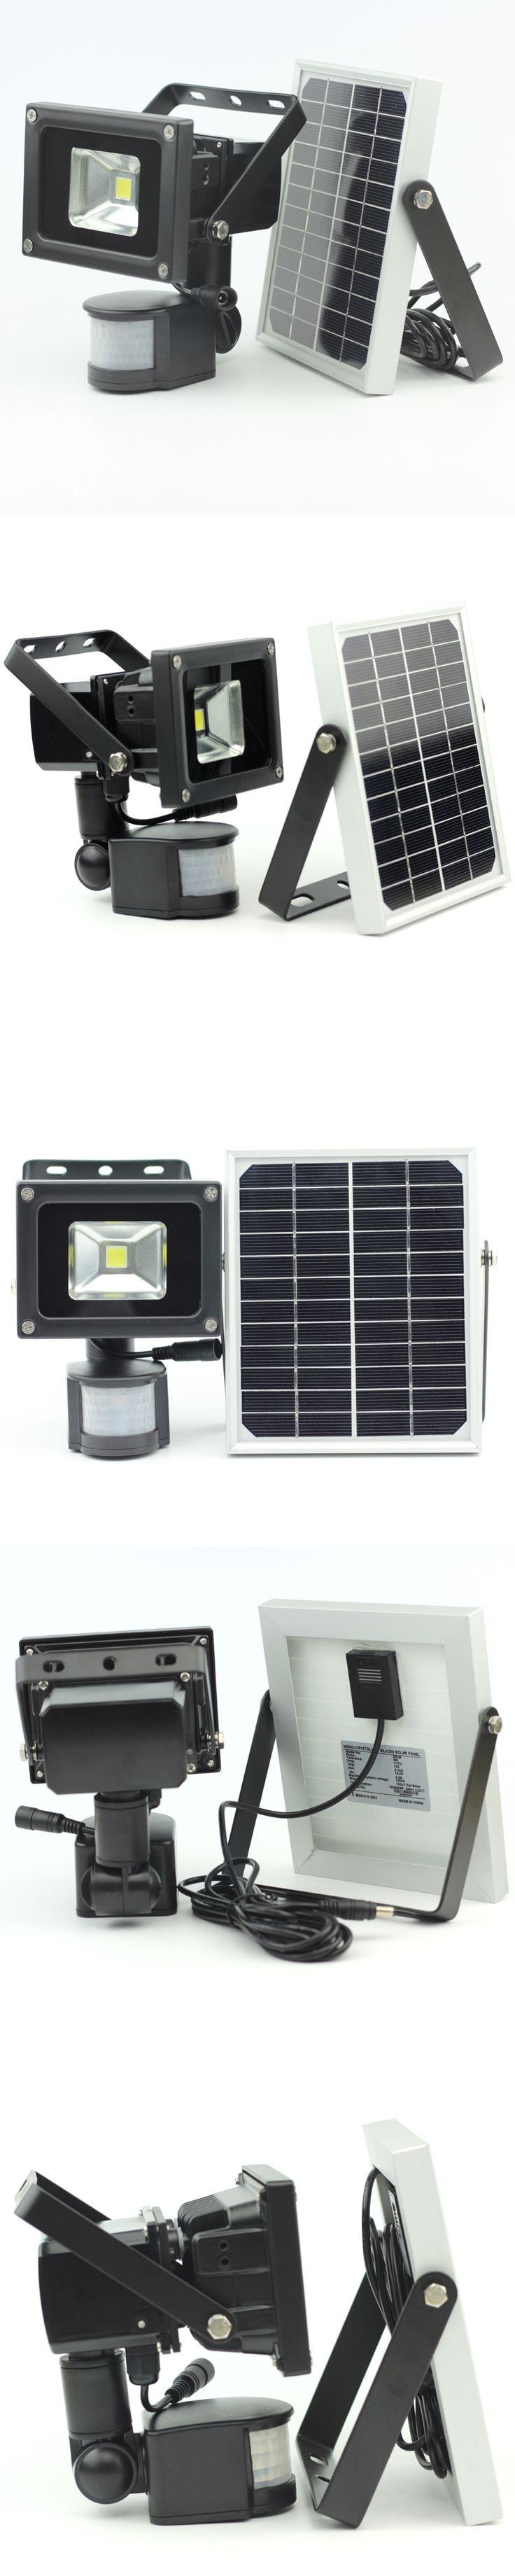 10W Solar Light Pir Motion Sensor LED Flood Light Infrared Motion Security Garden Light Outdoor Wall Lawn Lighting